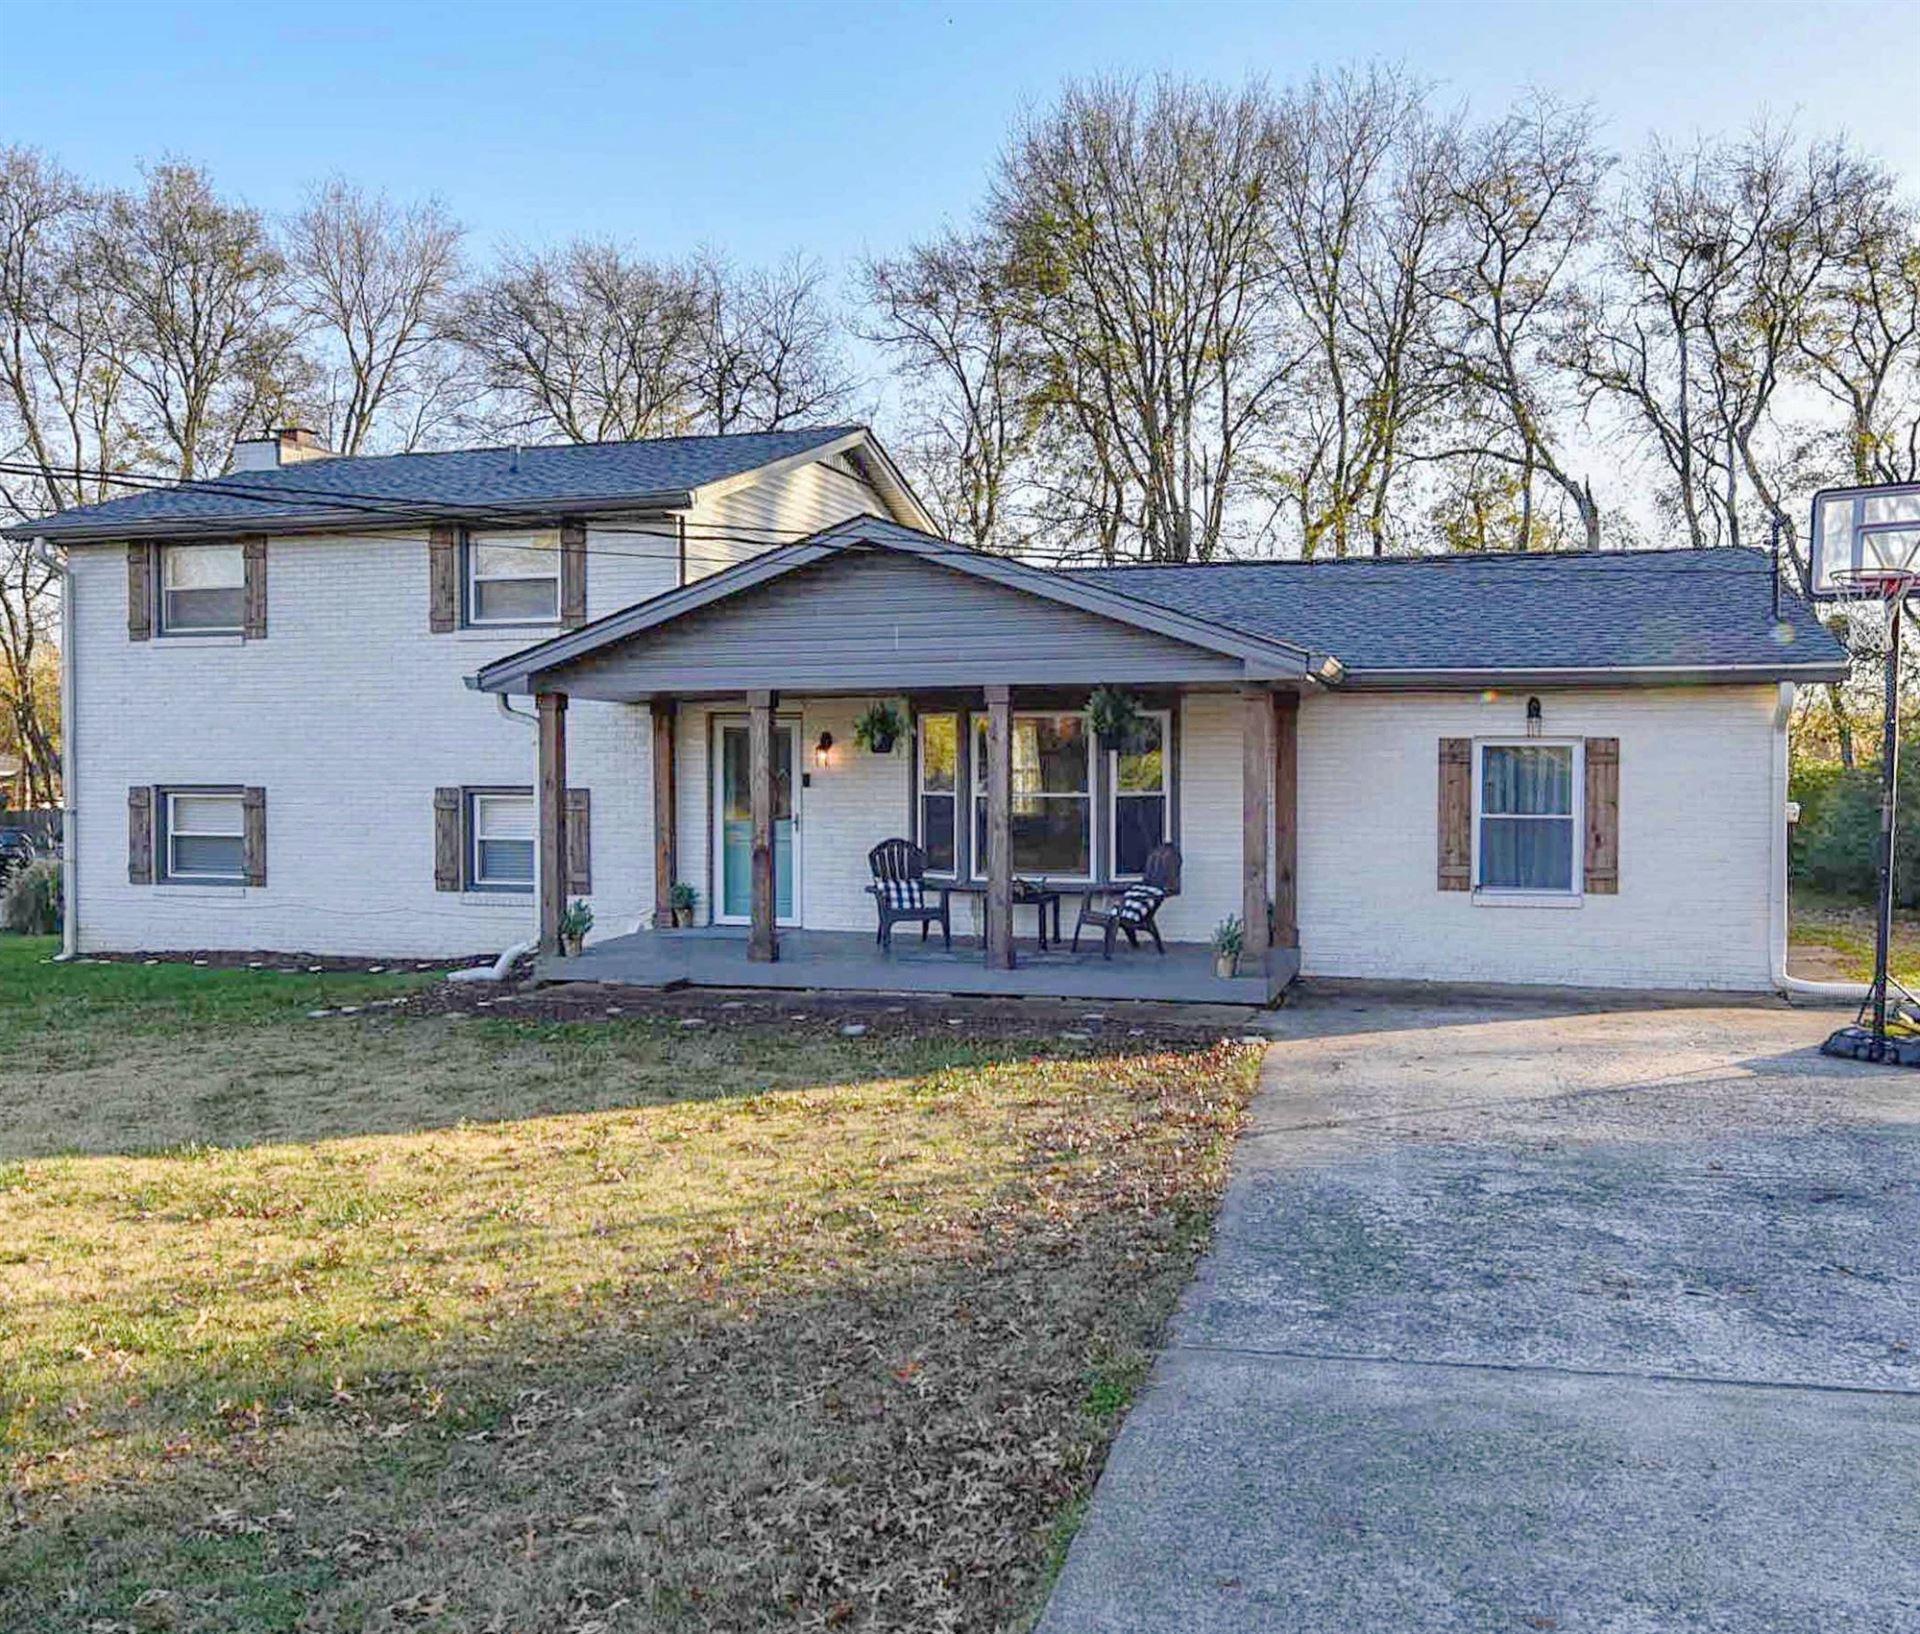 106 Colonial Dr, Hendersonville, TN 37075 - MLS#: 2206985